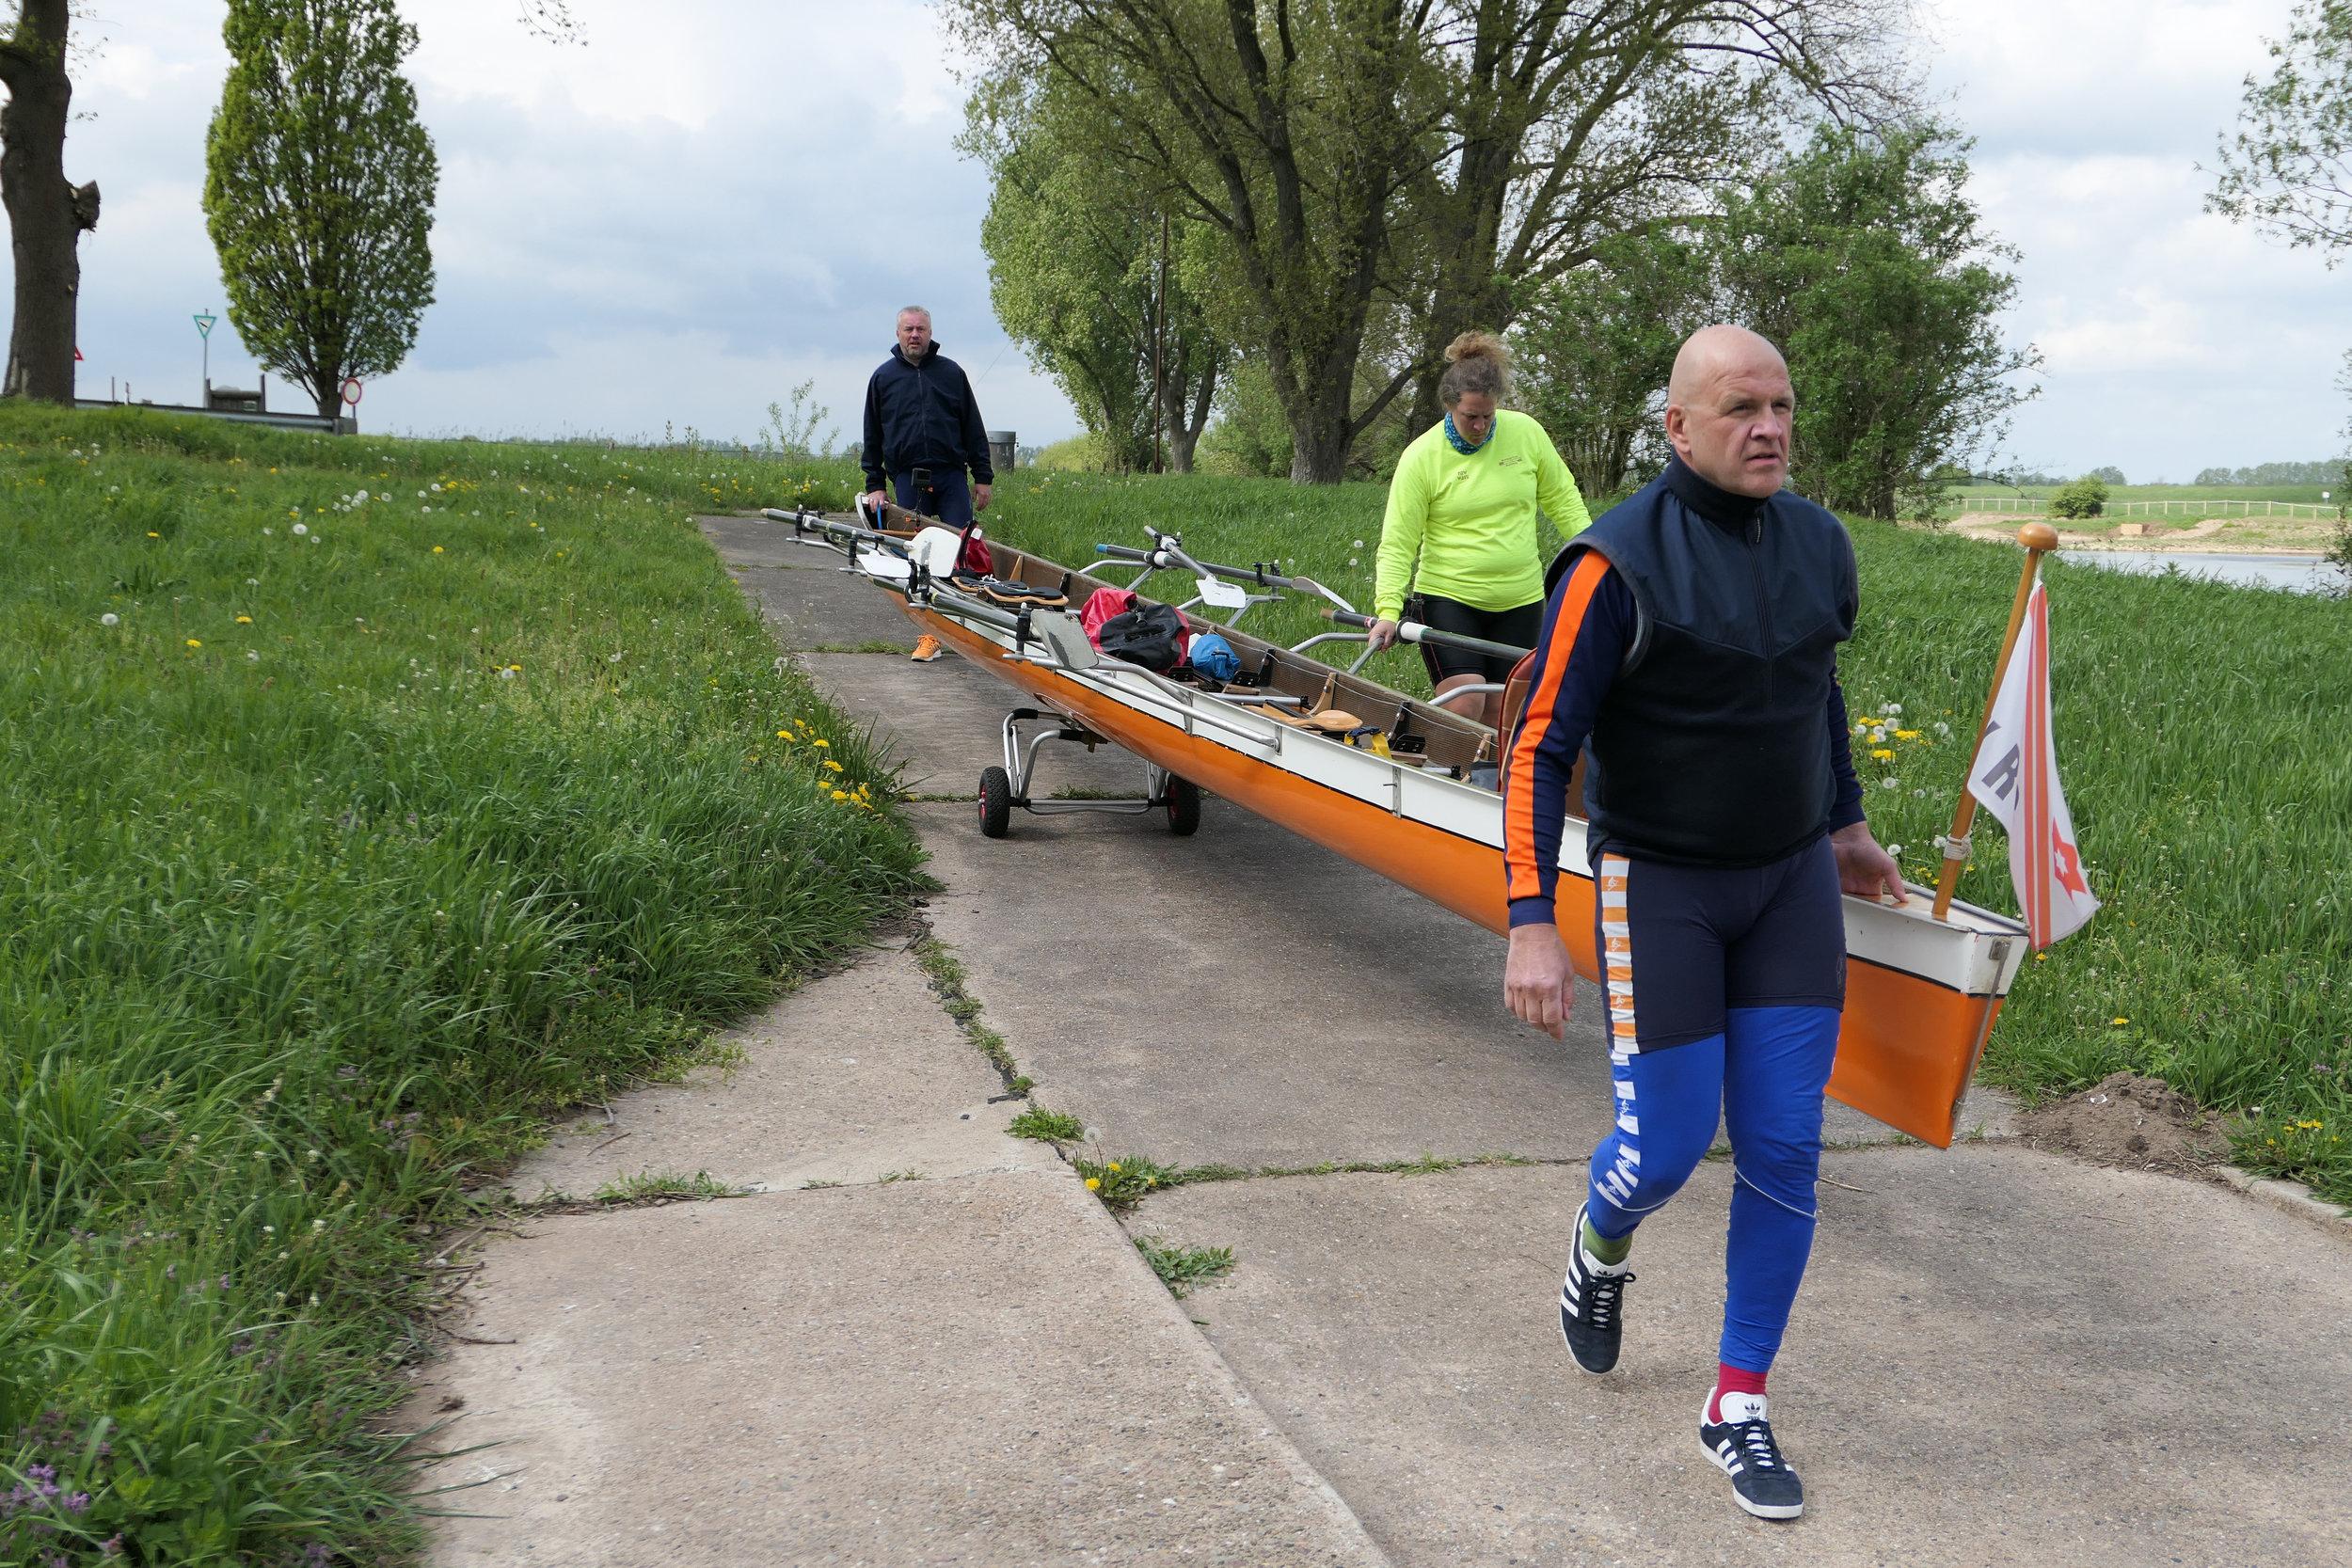 maiwanderfahrt-weser-2019-2_0069_2019-04-28_14-15-36.jpg